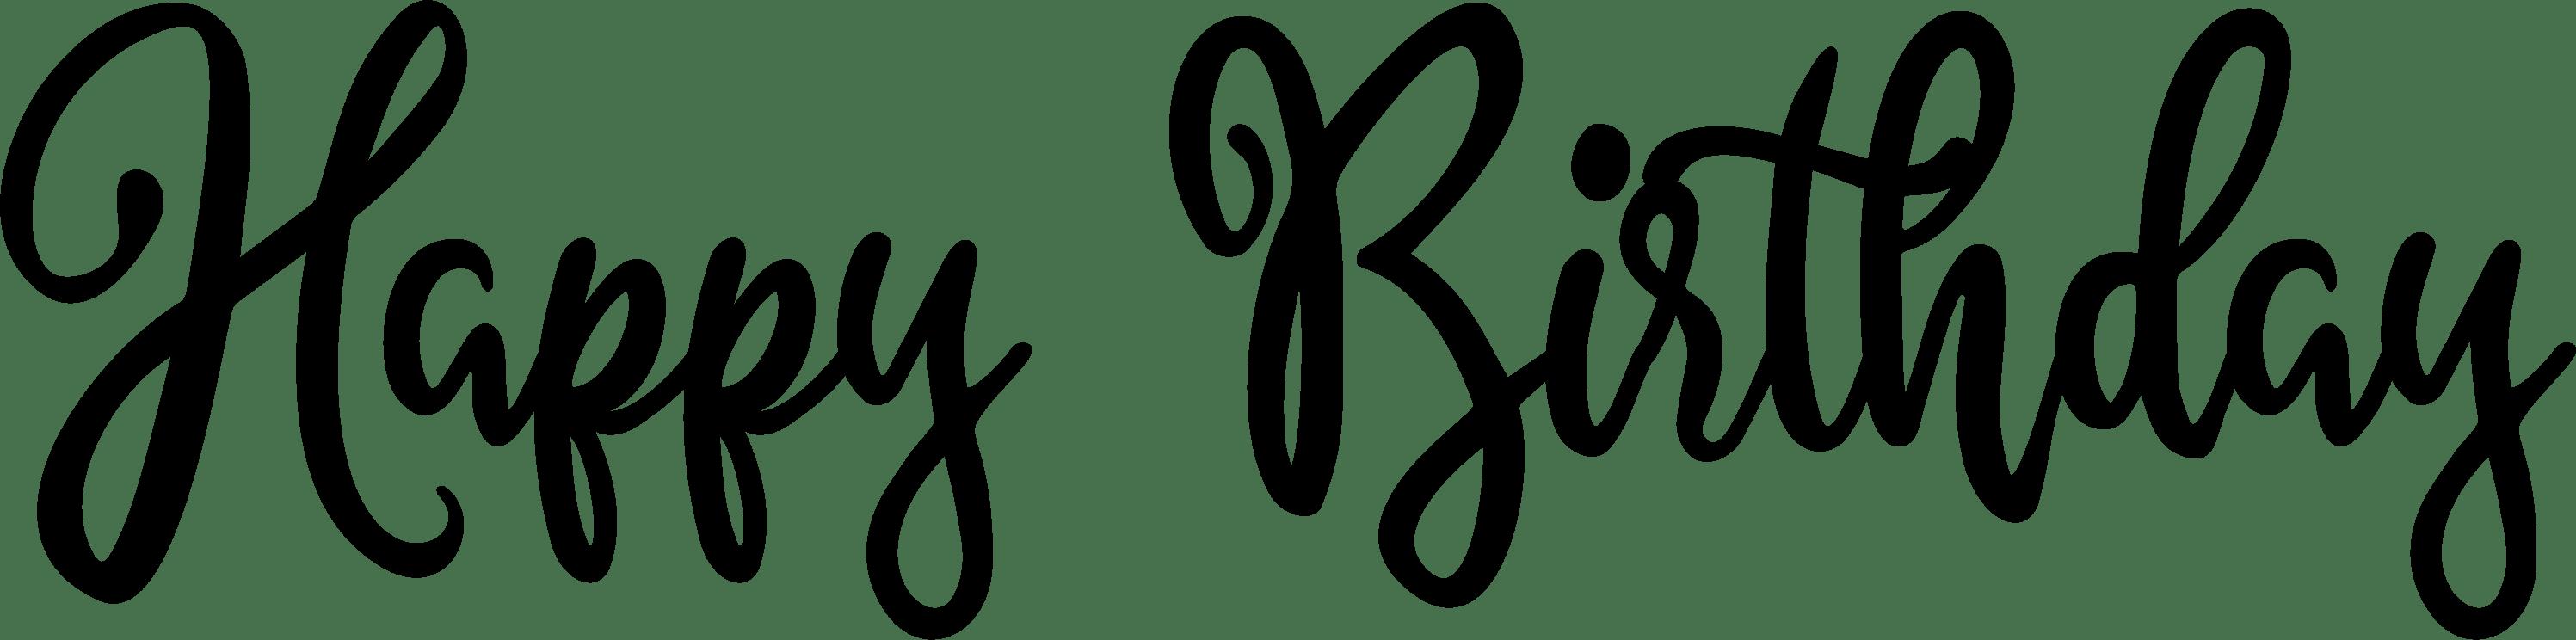 Happy Birthday Word Art Alyssum Blossom